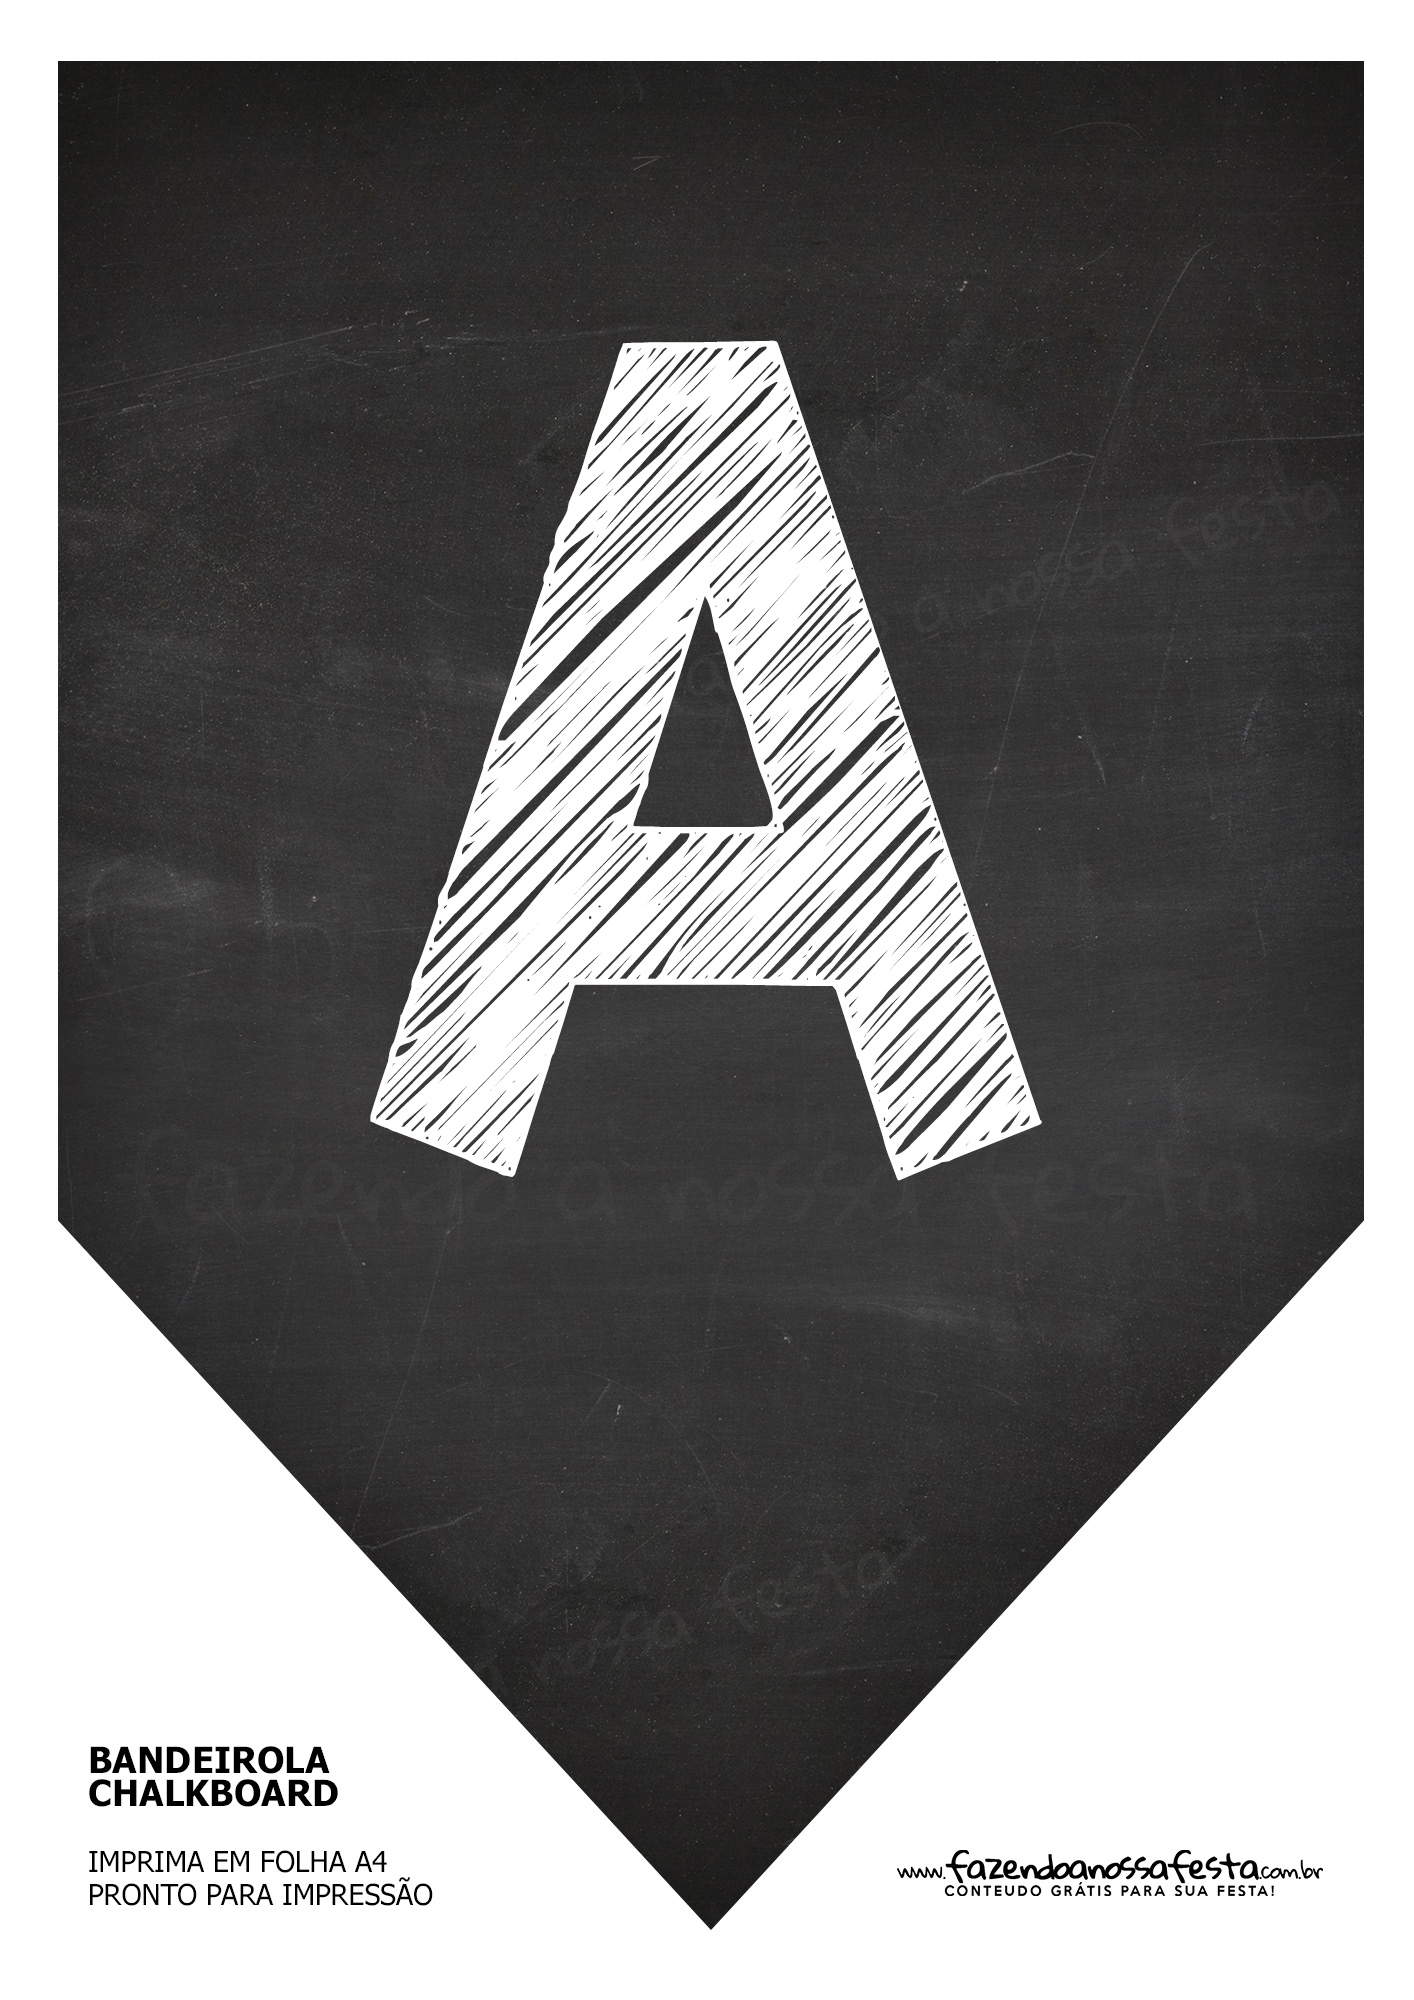 Bandeirola Chalkboard A